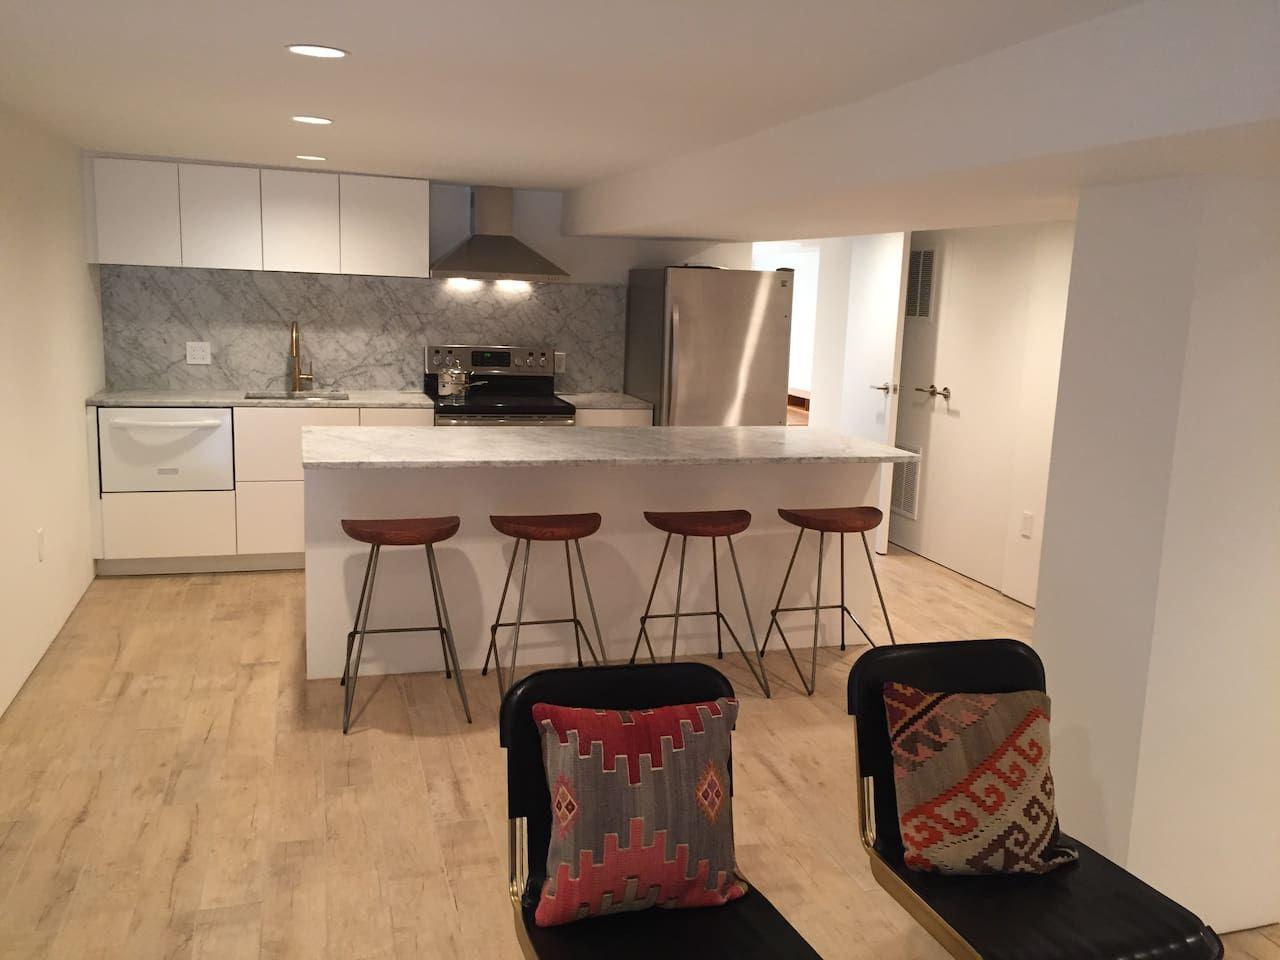 Sunny NoMa English Basement Apartment - Apartments for ...